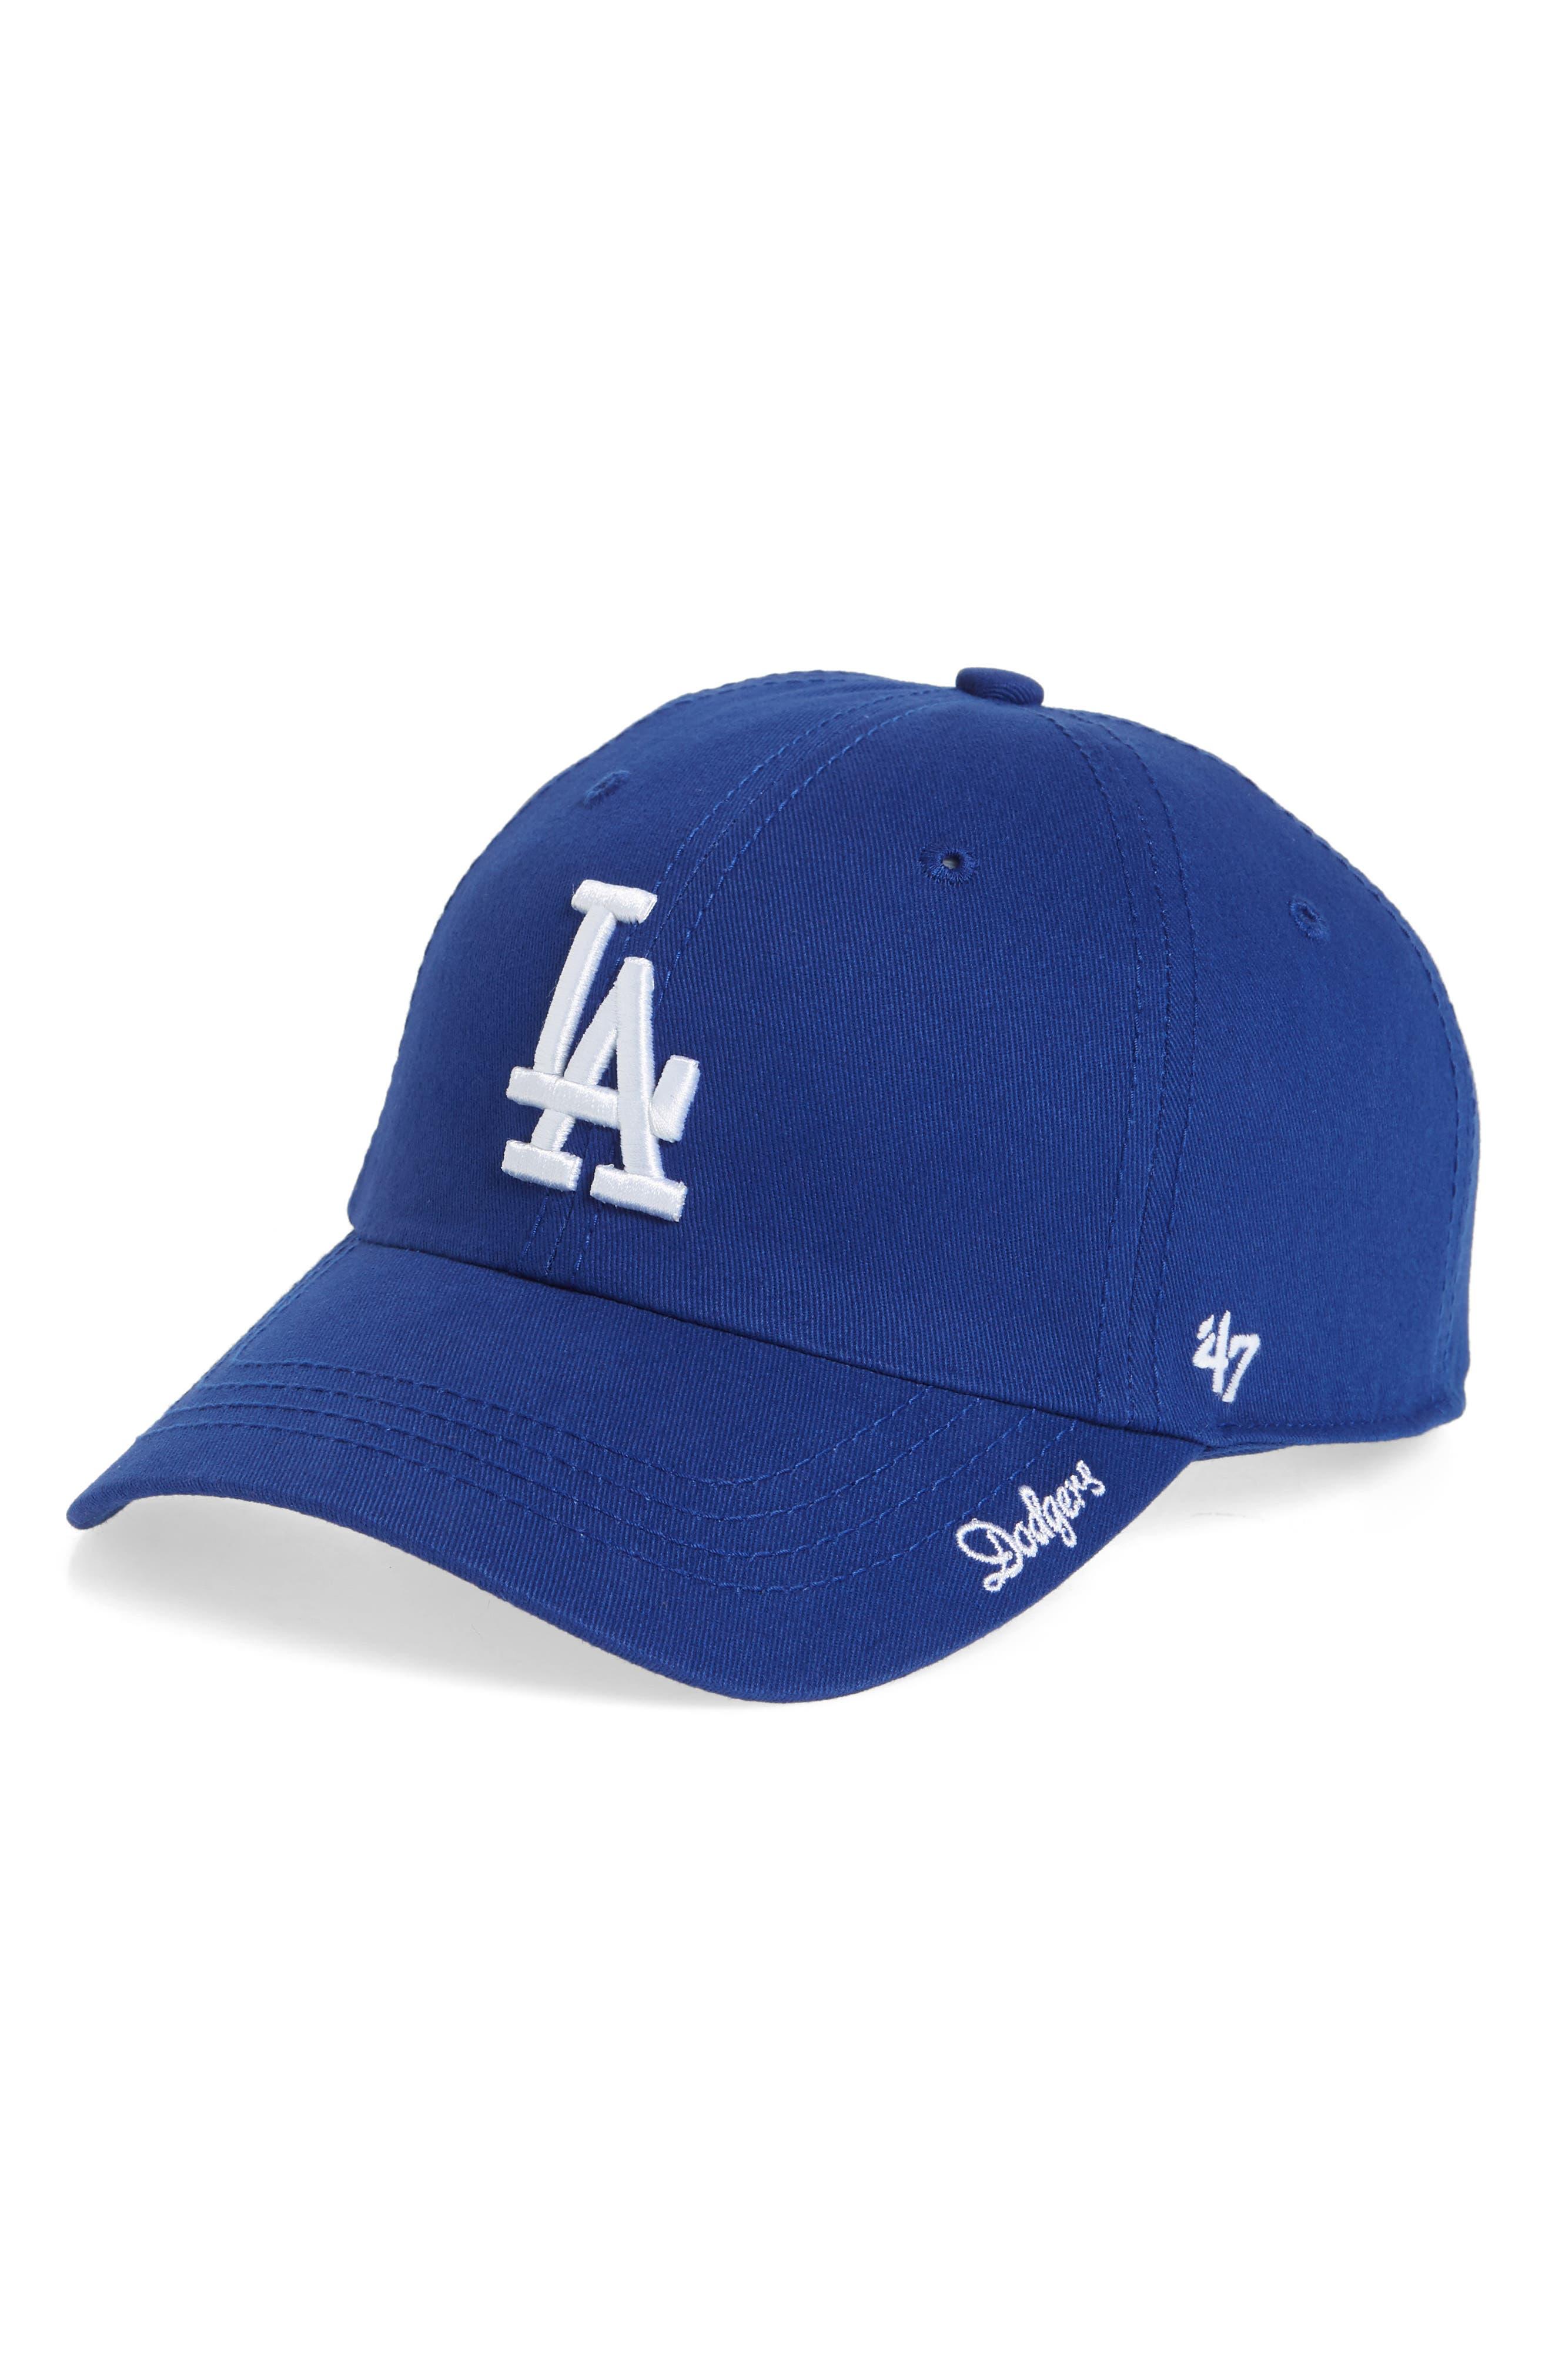 Miata Clean-Up Los Angeles Dodgers Baseball Cap,                             Main thumbnail 1, color,                             400